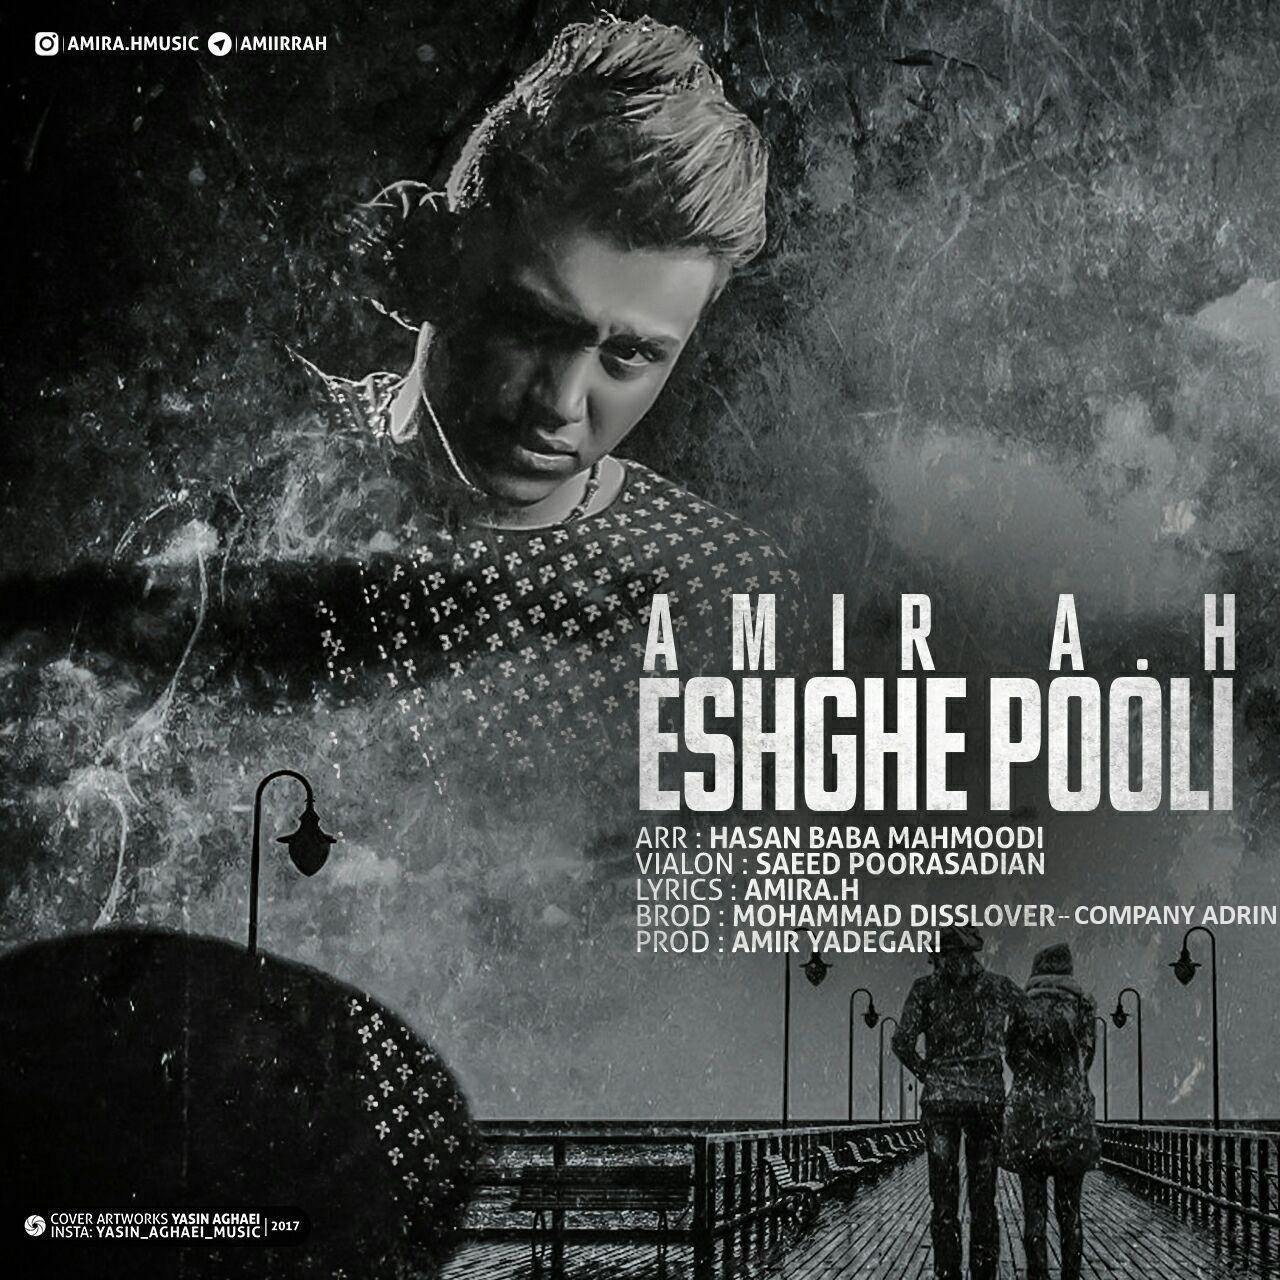 Amir A.H – Eshghe Pooli